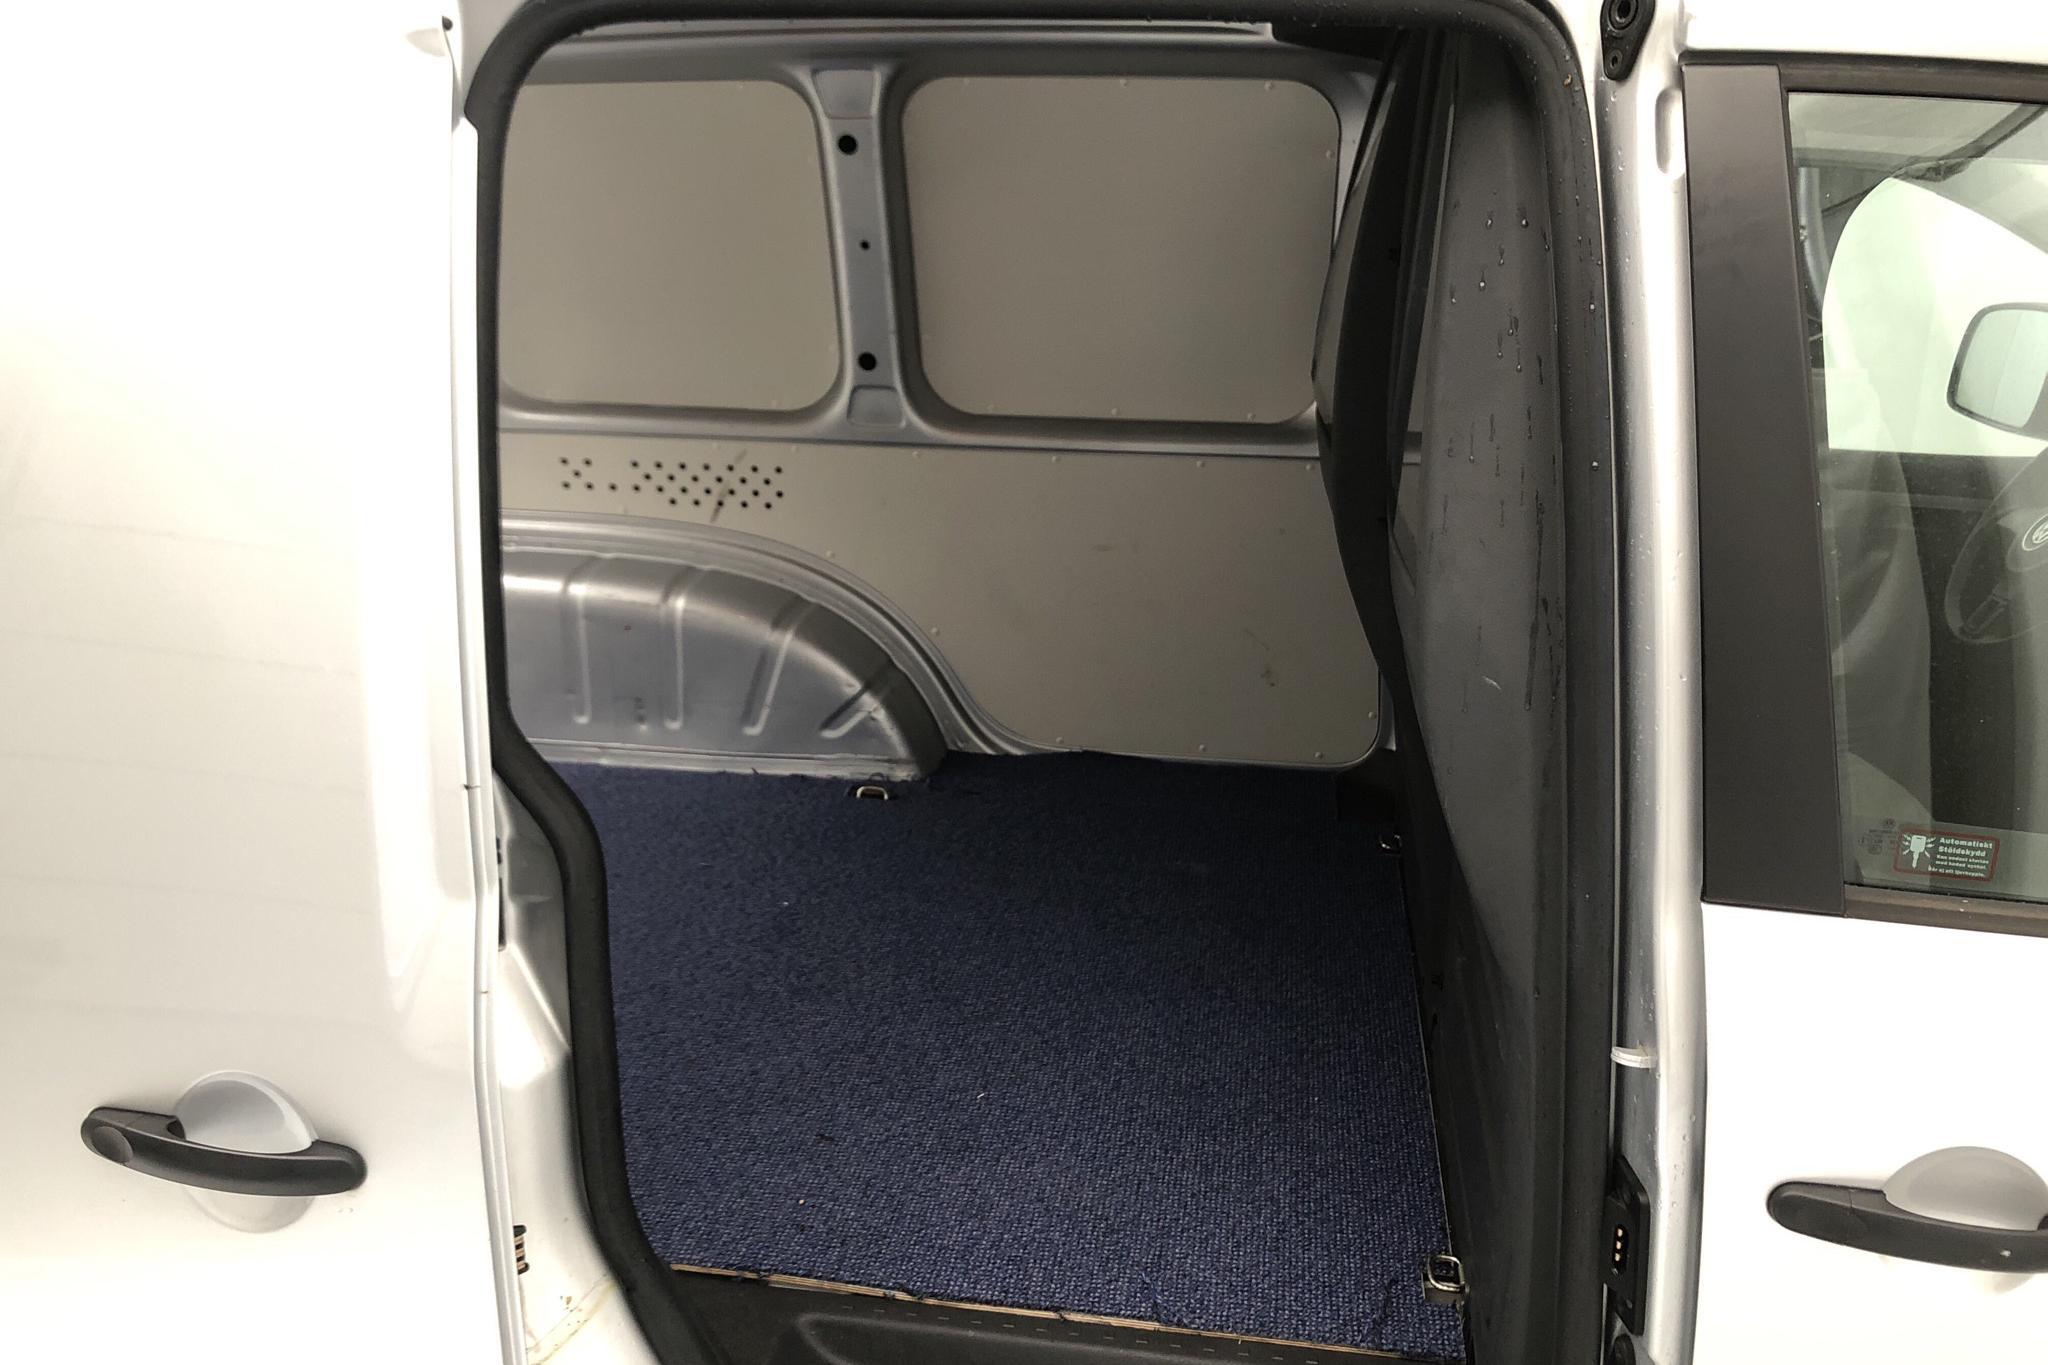 VW Caddy 1.6 TDI Skåp (75hk) - 3 796 mil - Manuell - silver - 2013